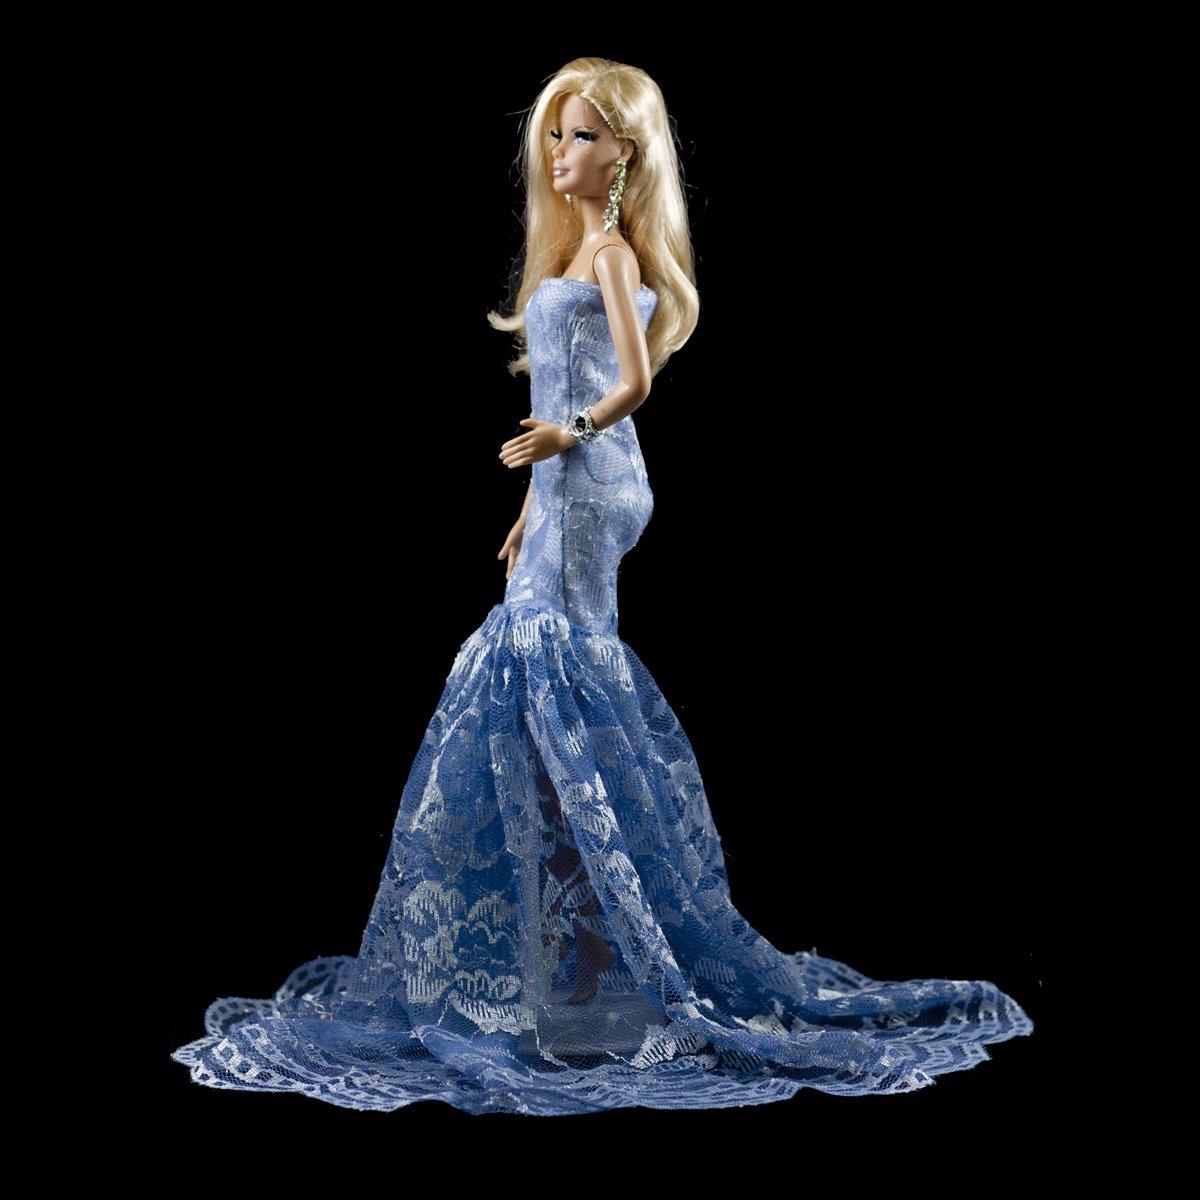 Barbie Blue Multitextured Lace Strapless Gown Blue Long Dress